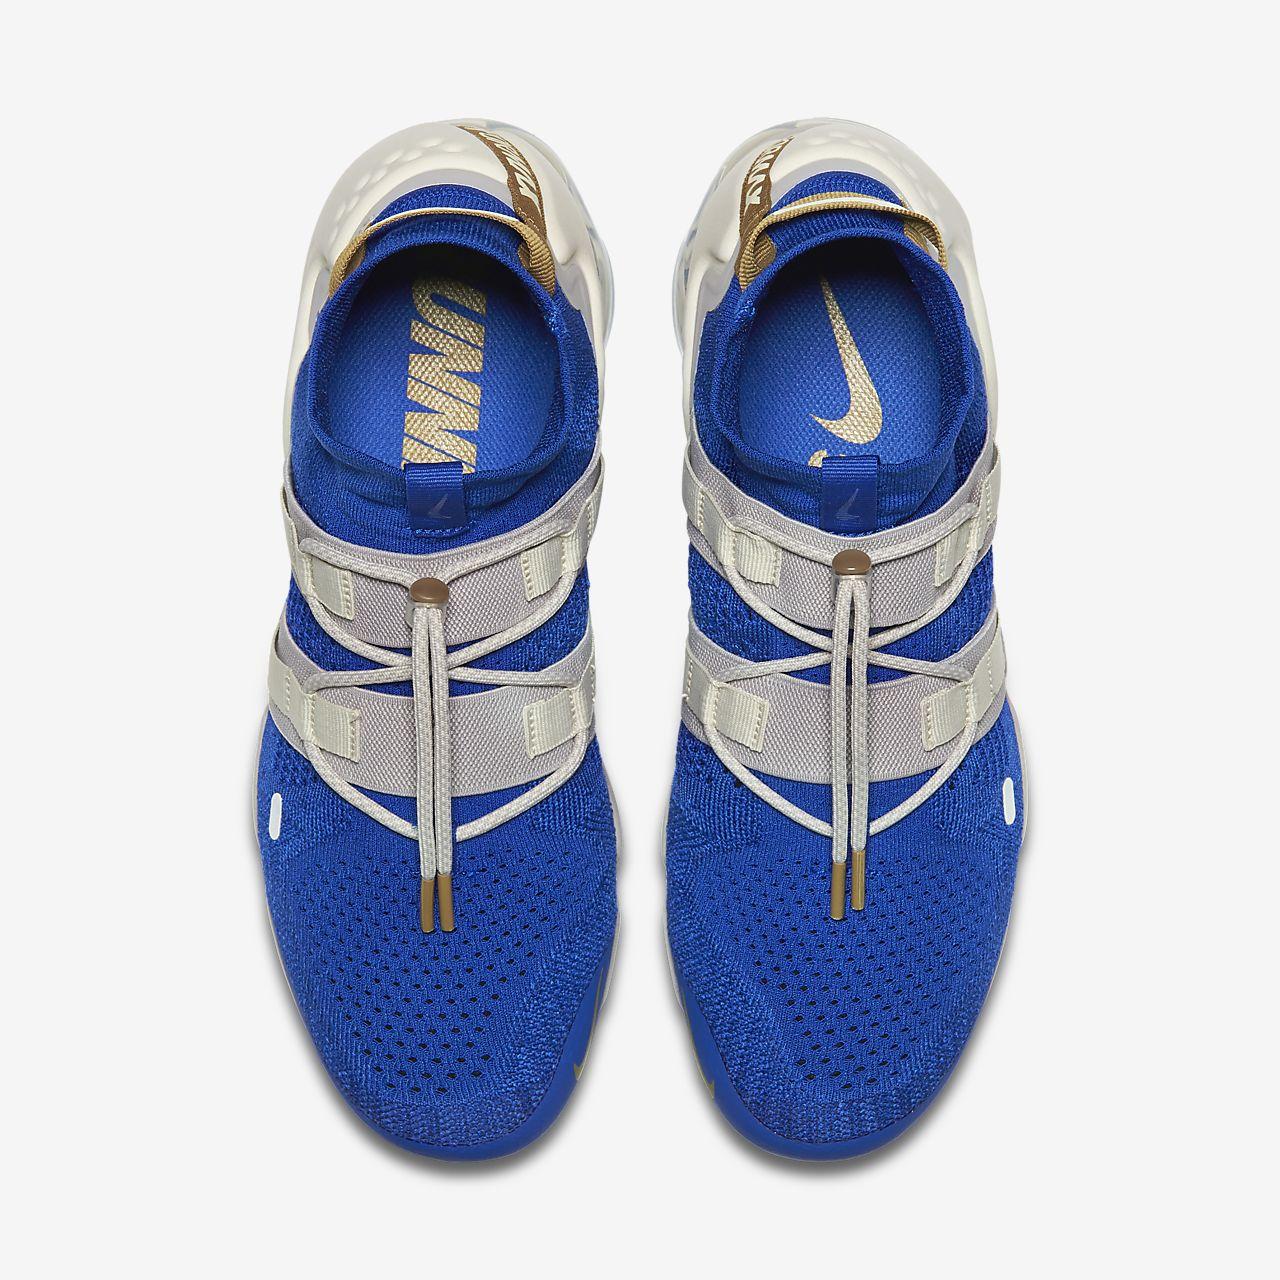 Nike Air Vapormax Flyknit Utility Blue & Black Release Info